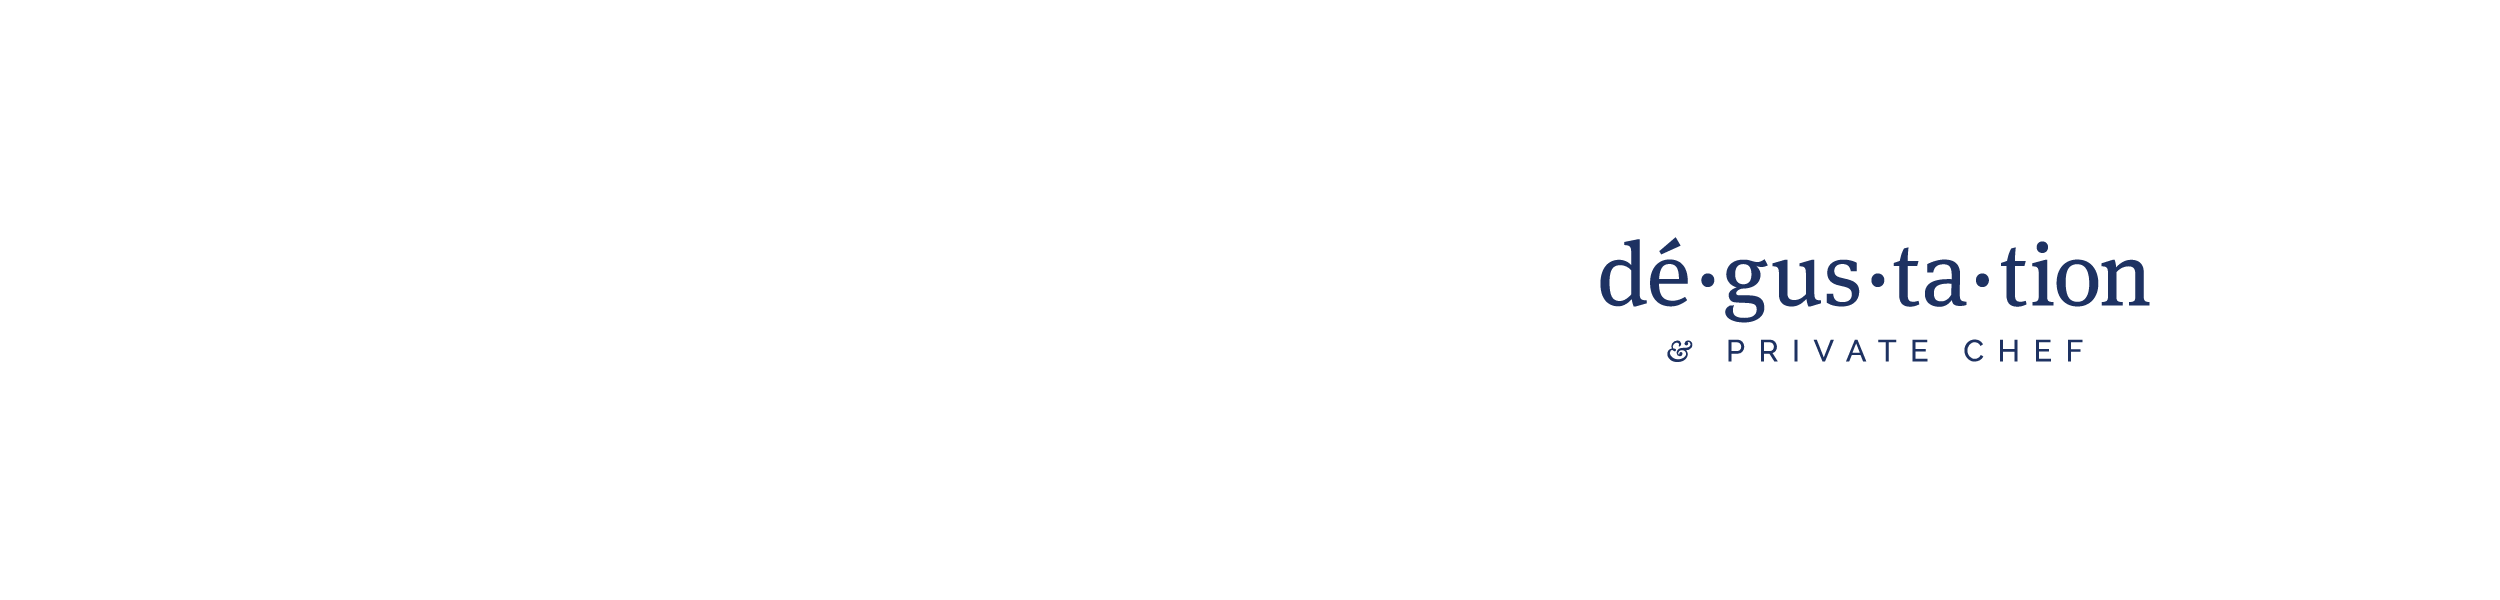 Degustation-logos-transparent2.png